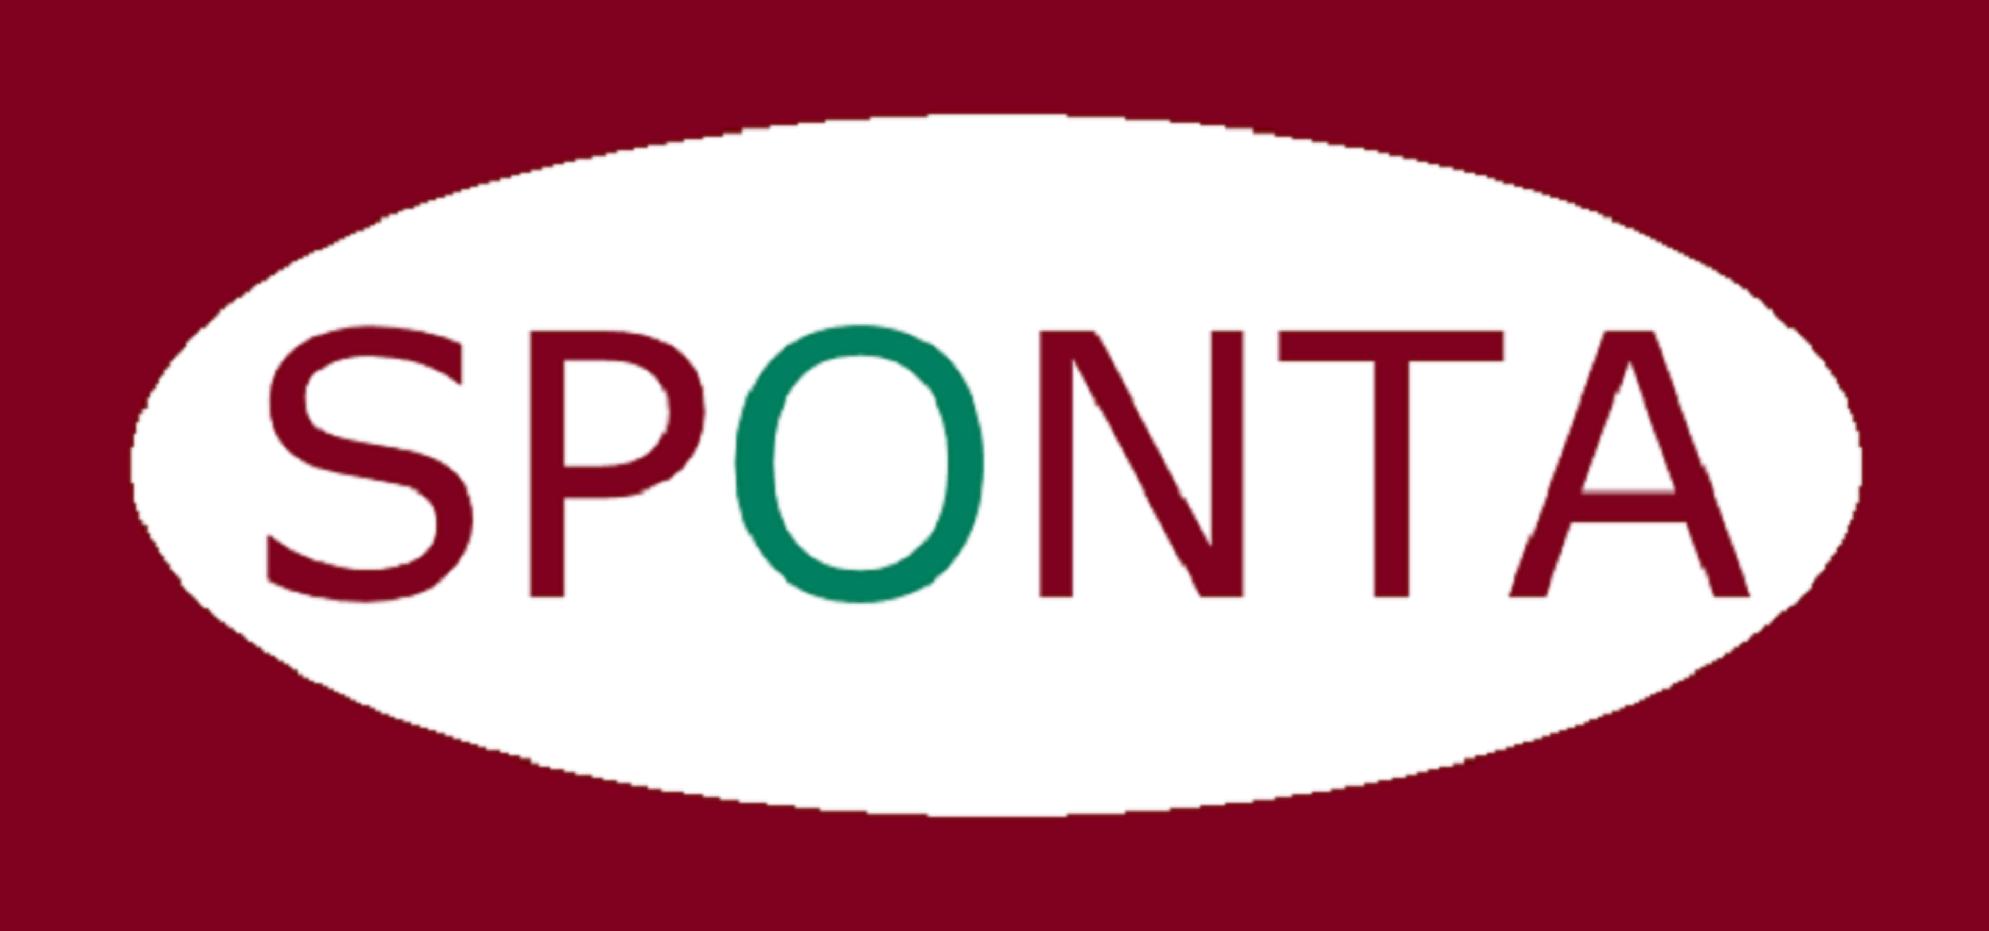 SPONTA